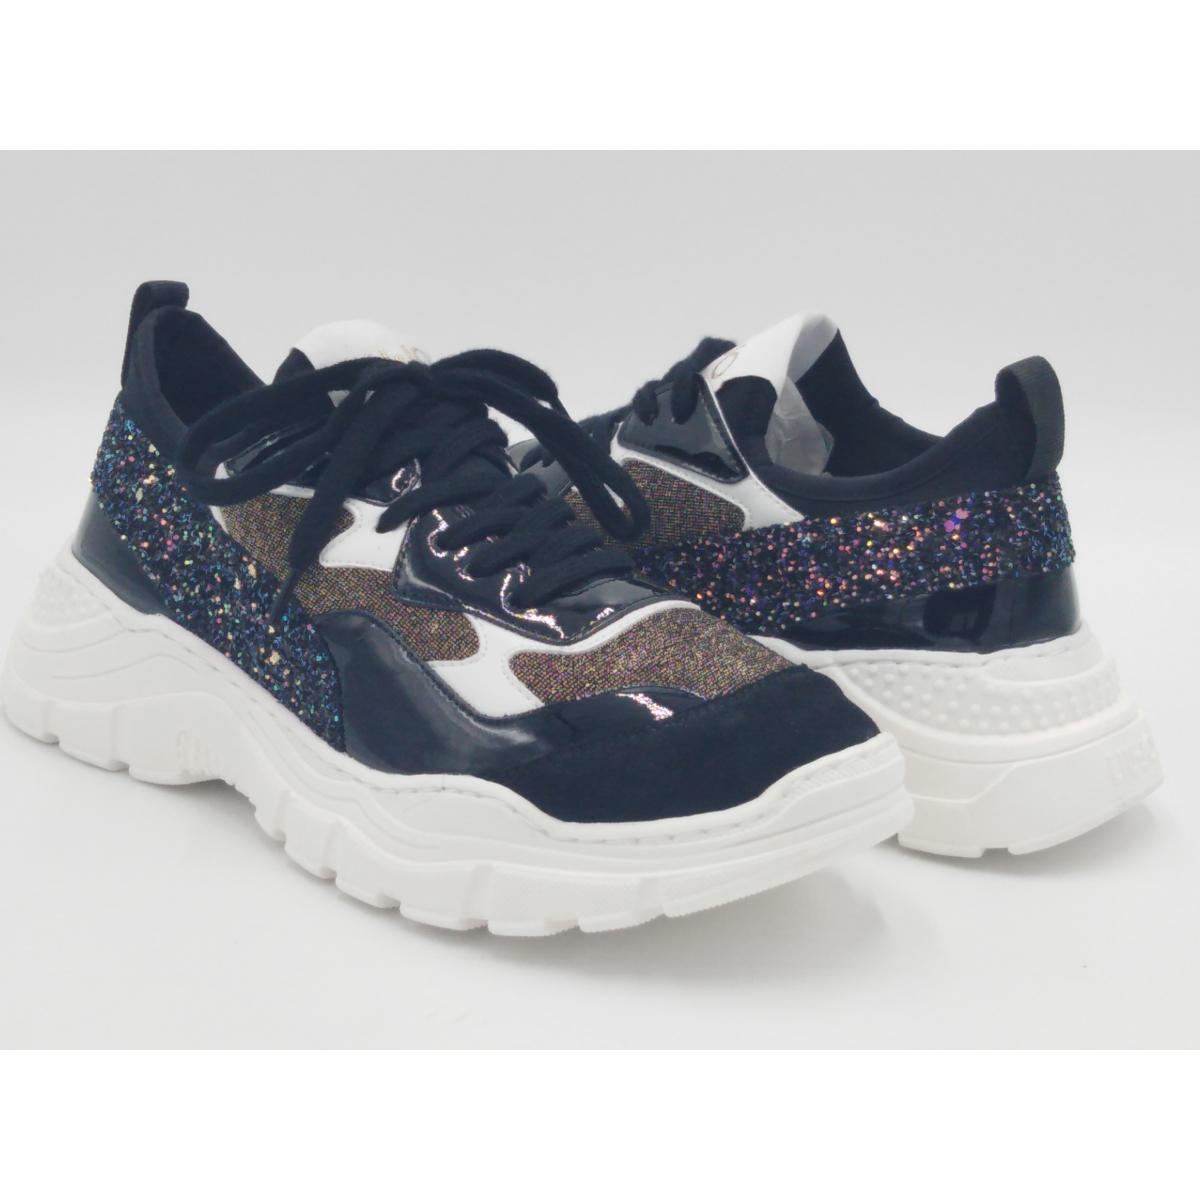 Sneaker slip on vernice nera glitter lurex plantare anatomico in pelle